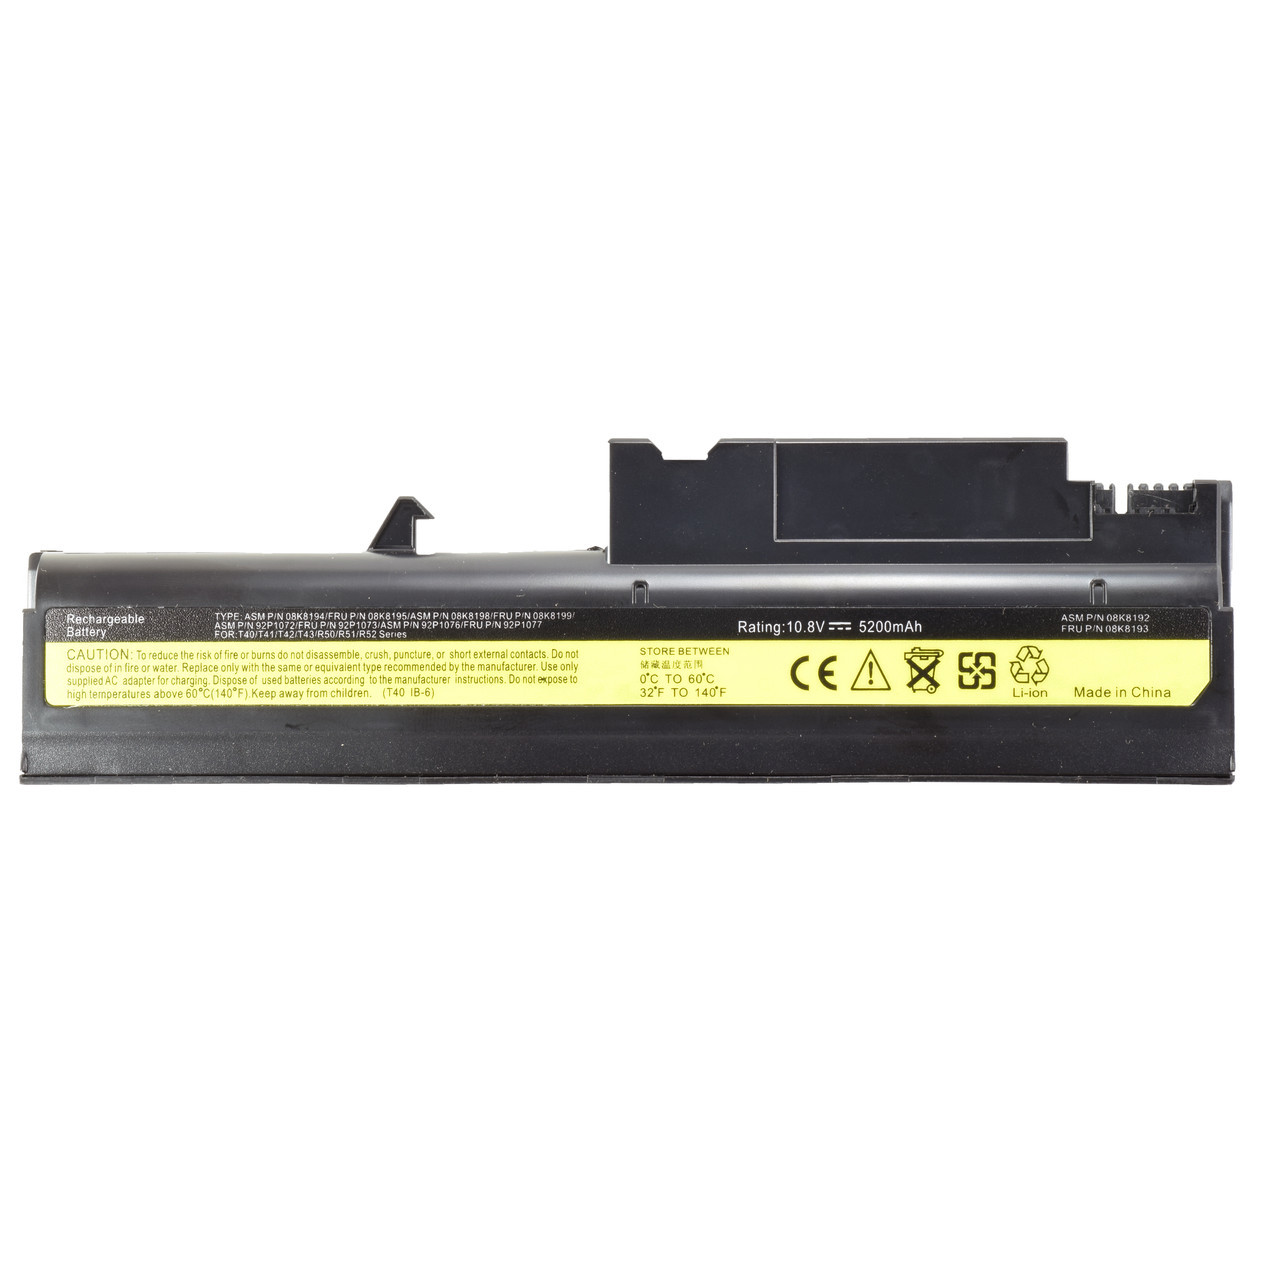 Батарея для ноутбука IBM 08K8194 92P1010 92P1011 92P1058 92P1060 92P1062 92P1067 92P1070 92P1071